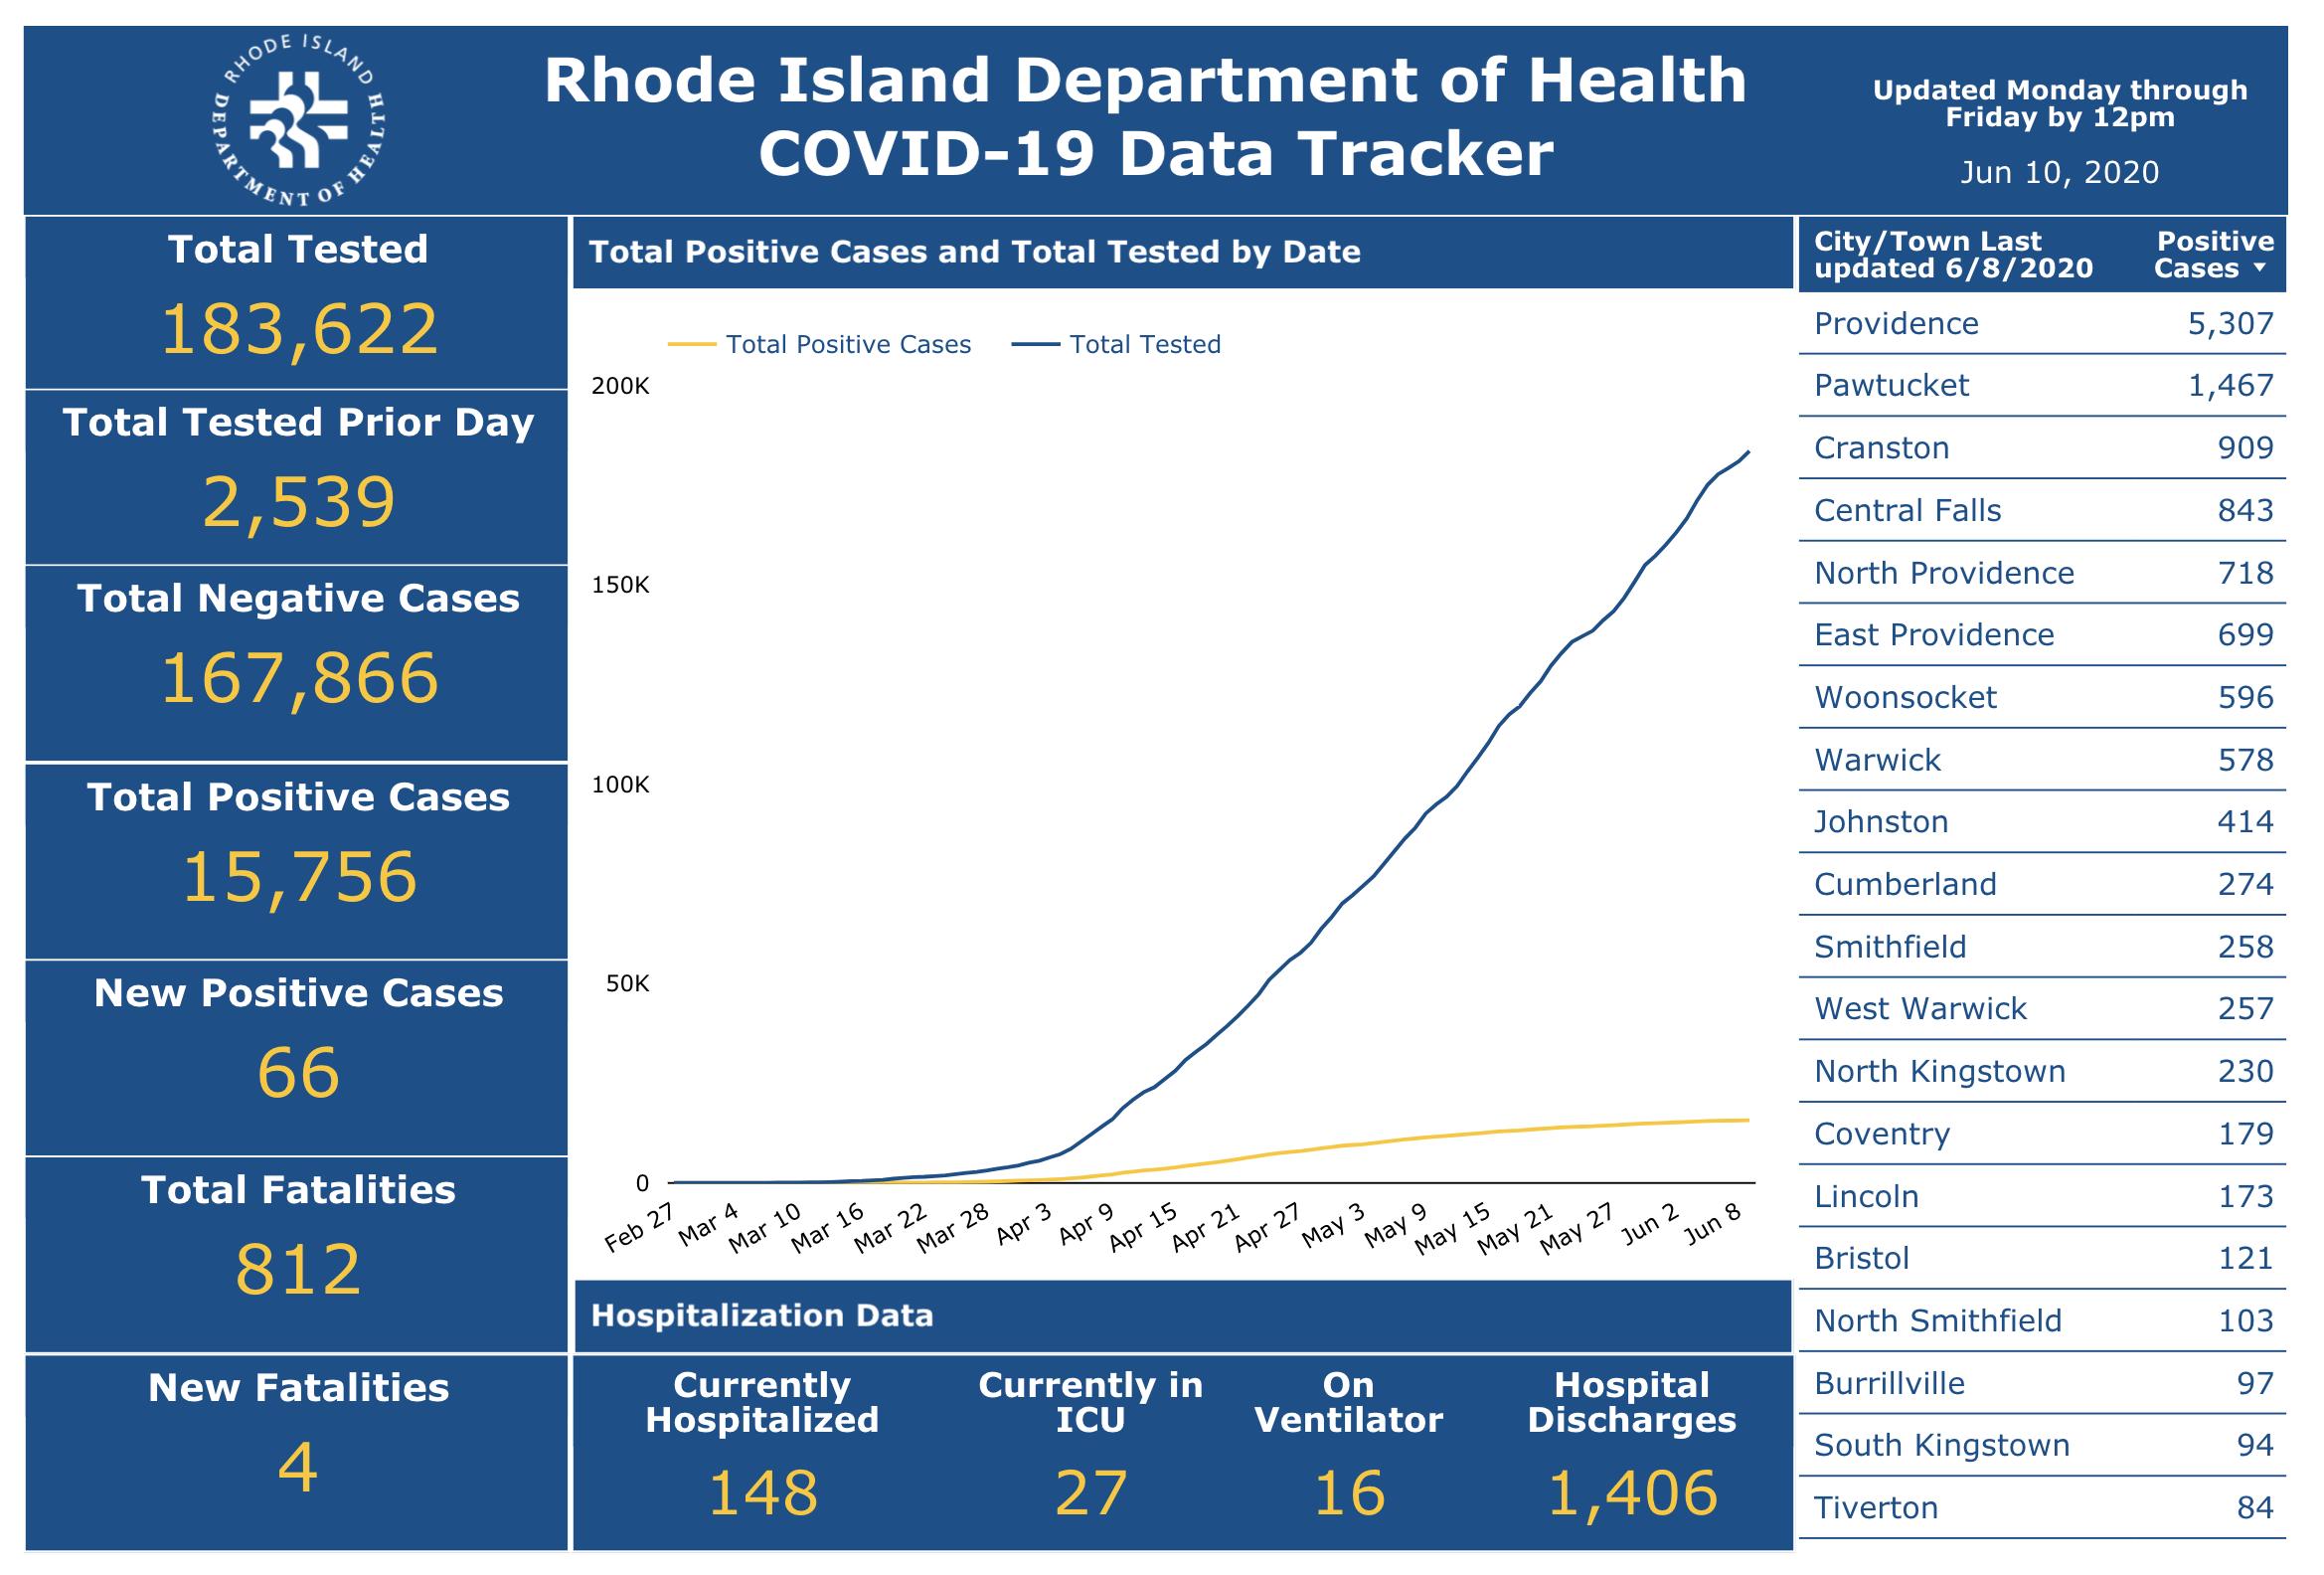 University Of Rhode Island 2021 2020 Calendar | Printable In Delaware State University 2021 2020 Calendar